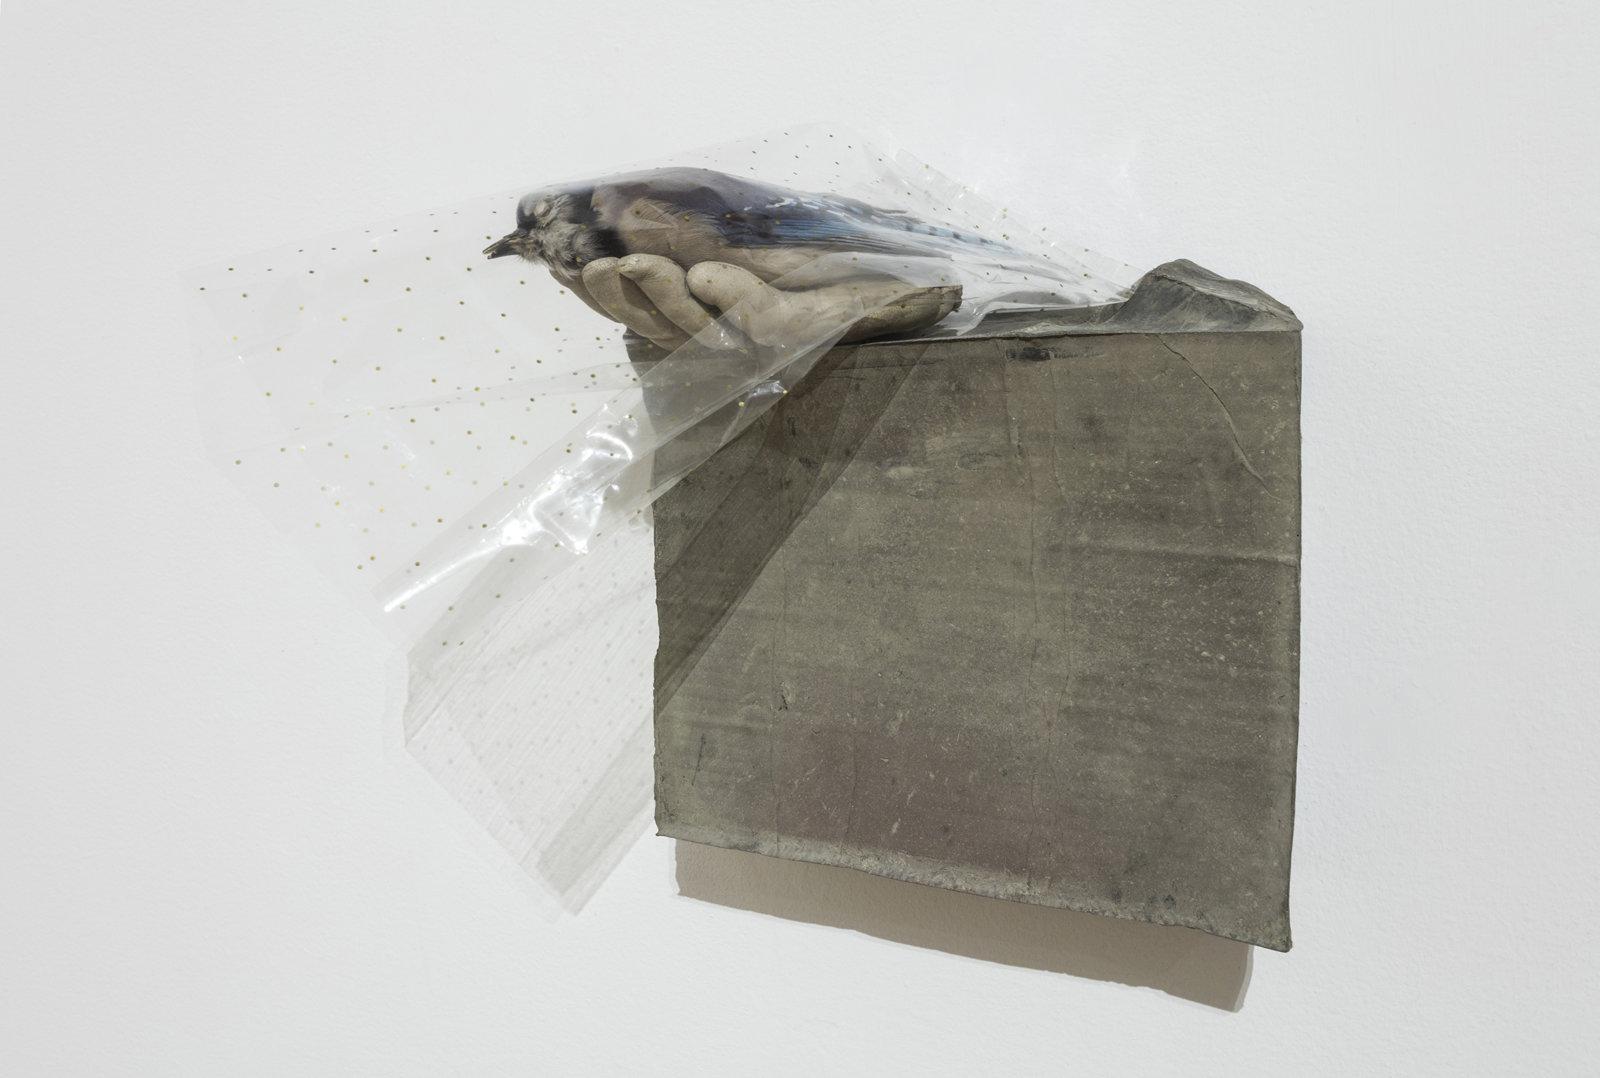 Liz Magor, Speckled Veil, 2015, polymerized gypsum, naturalized bird, cellophane, 14 x 12 x 13 in. (35 x 31 x 33 cm). Installation view, Habitude, Musée d'art contemporain de Montréal, 2016 by Liz Magor